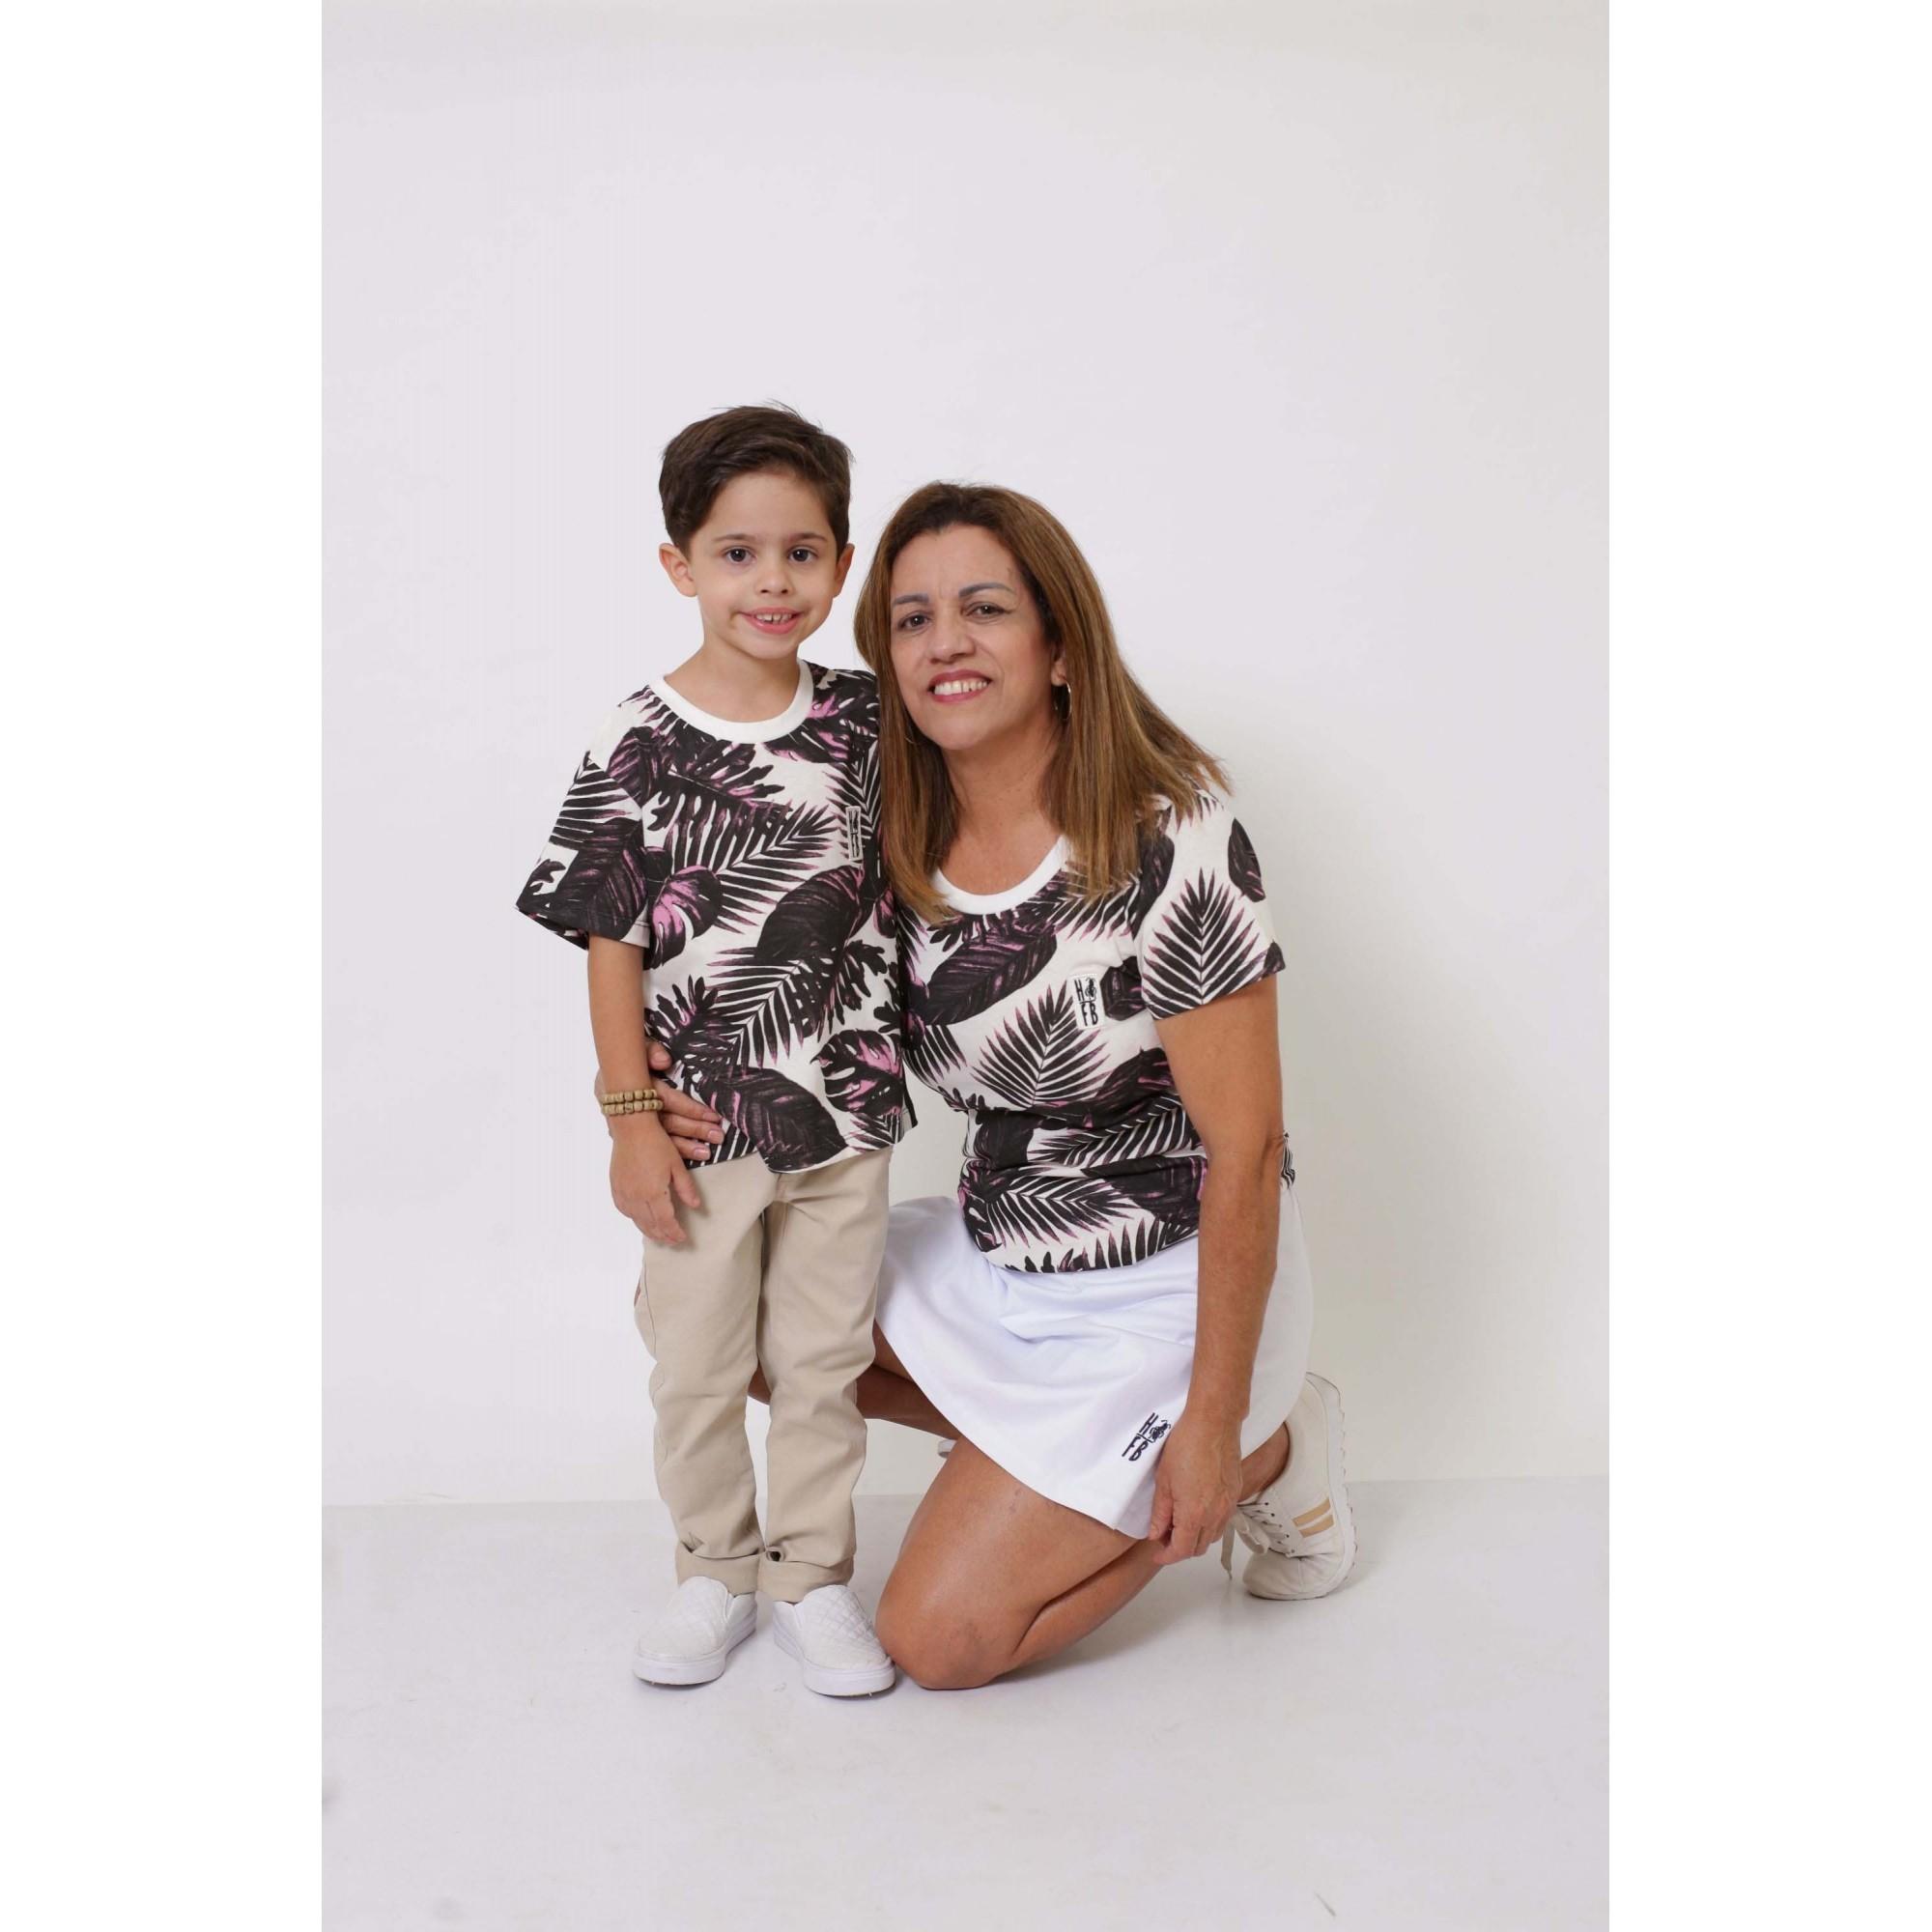 AVÓ E NETO > Kit 02 Peças - T-Shirts ou Body Cancun [Coleção Tal Avó Tal Neto]  - Heitor Fashion Brazil